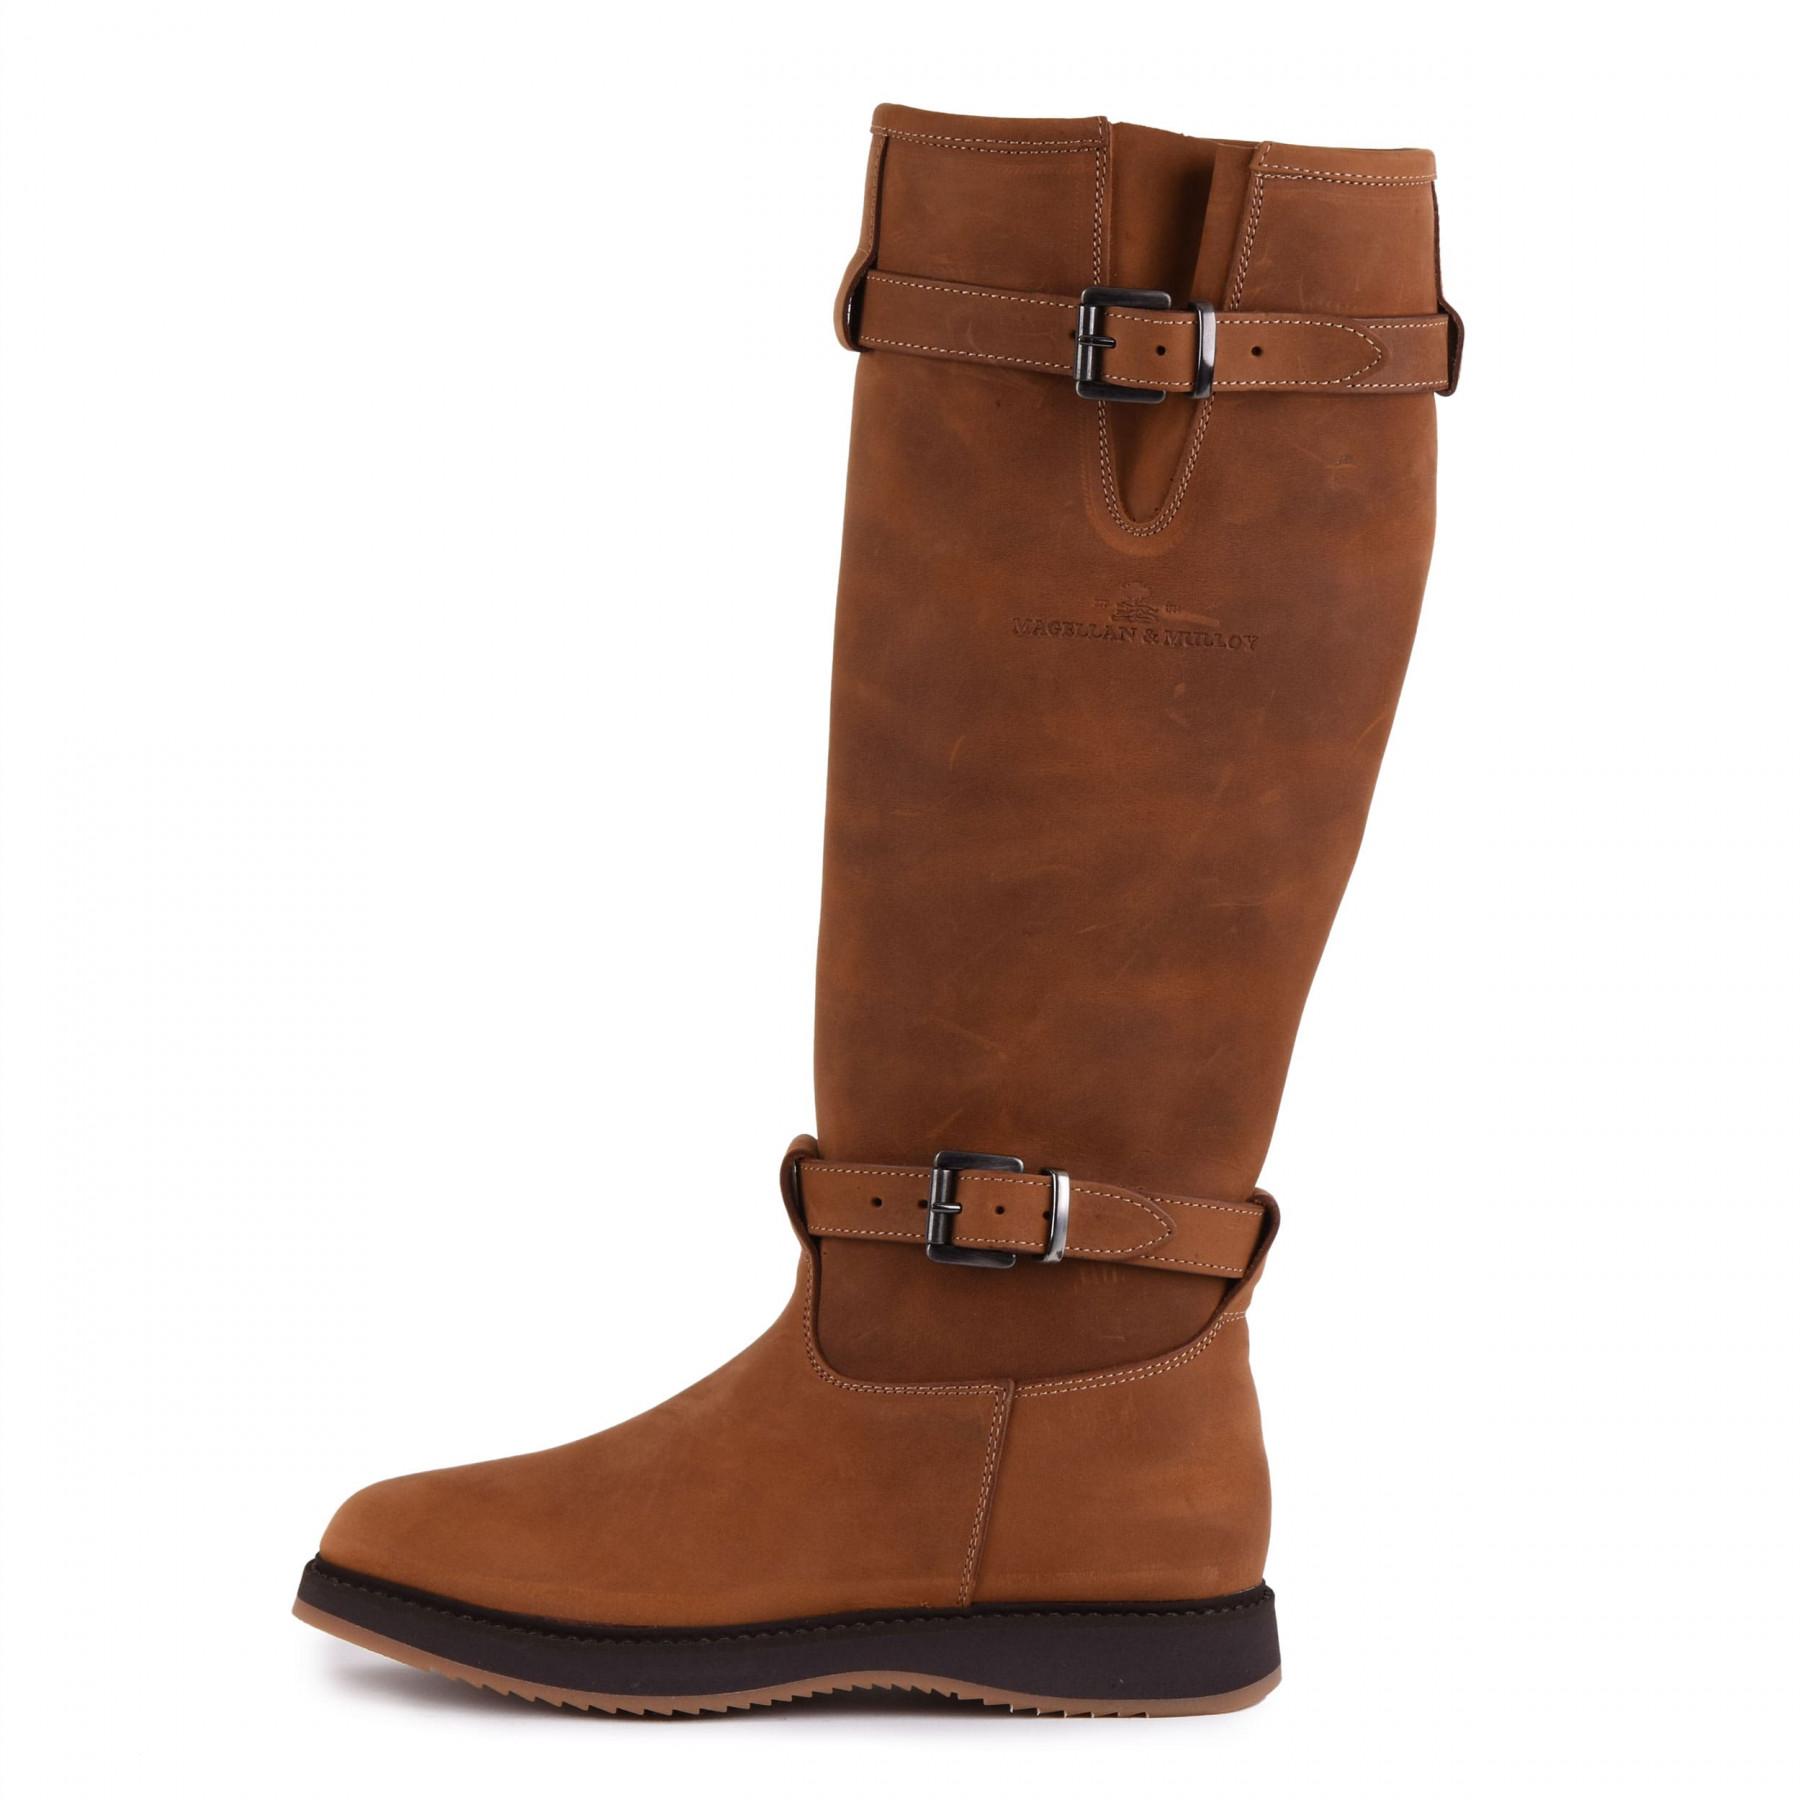 Magellan & Mulloy Xscape Denver Brandy, brandy ladies outdoor boot, size 36